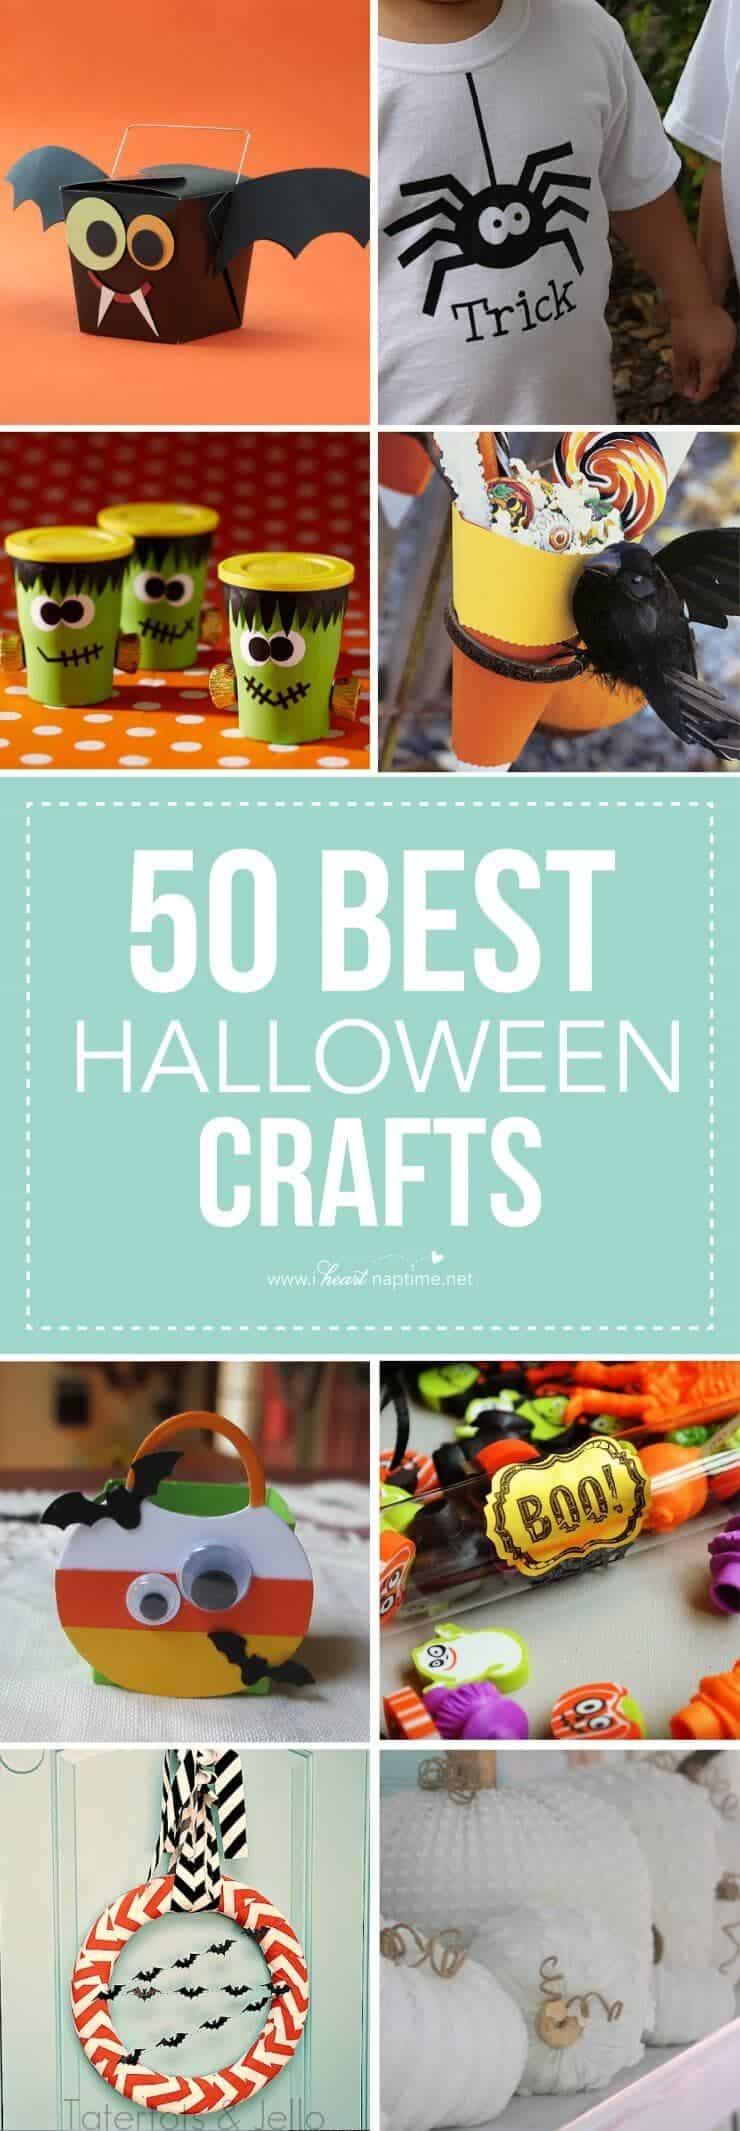 50 of the BEST Halloween craft ideas!